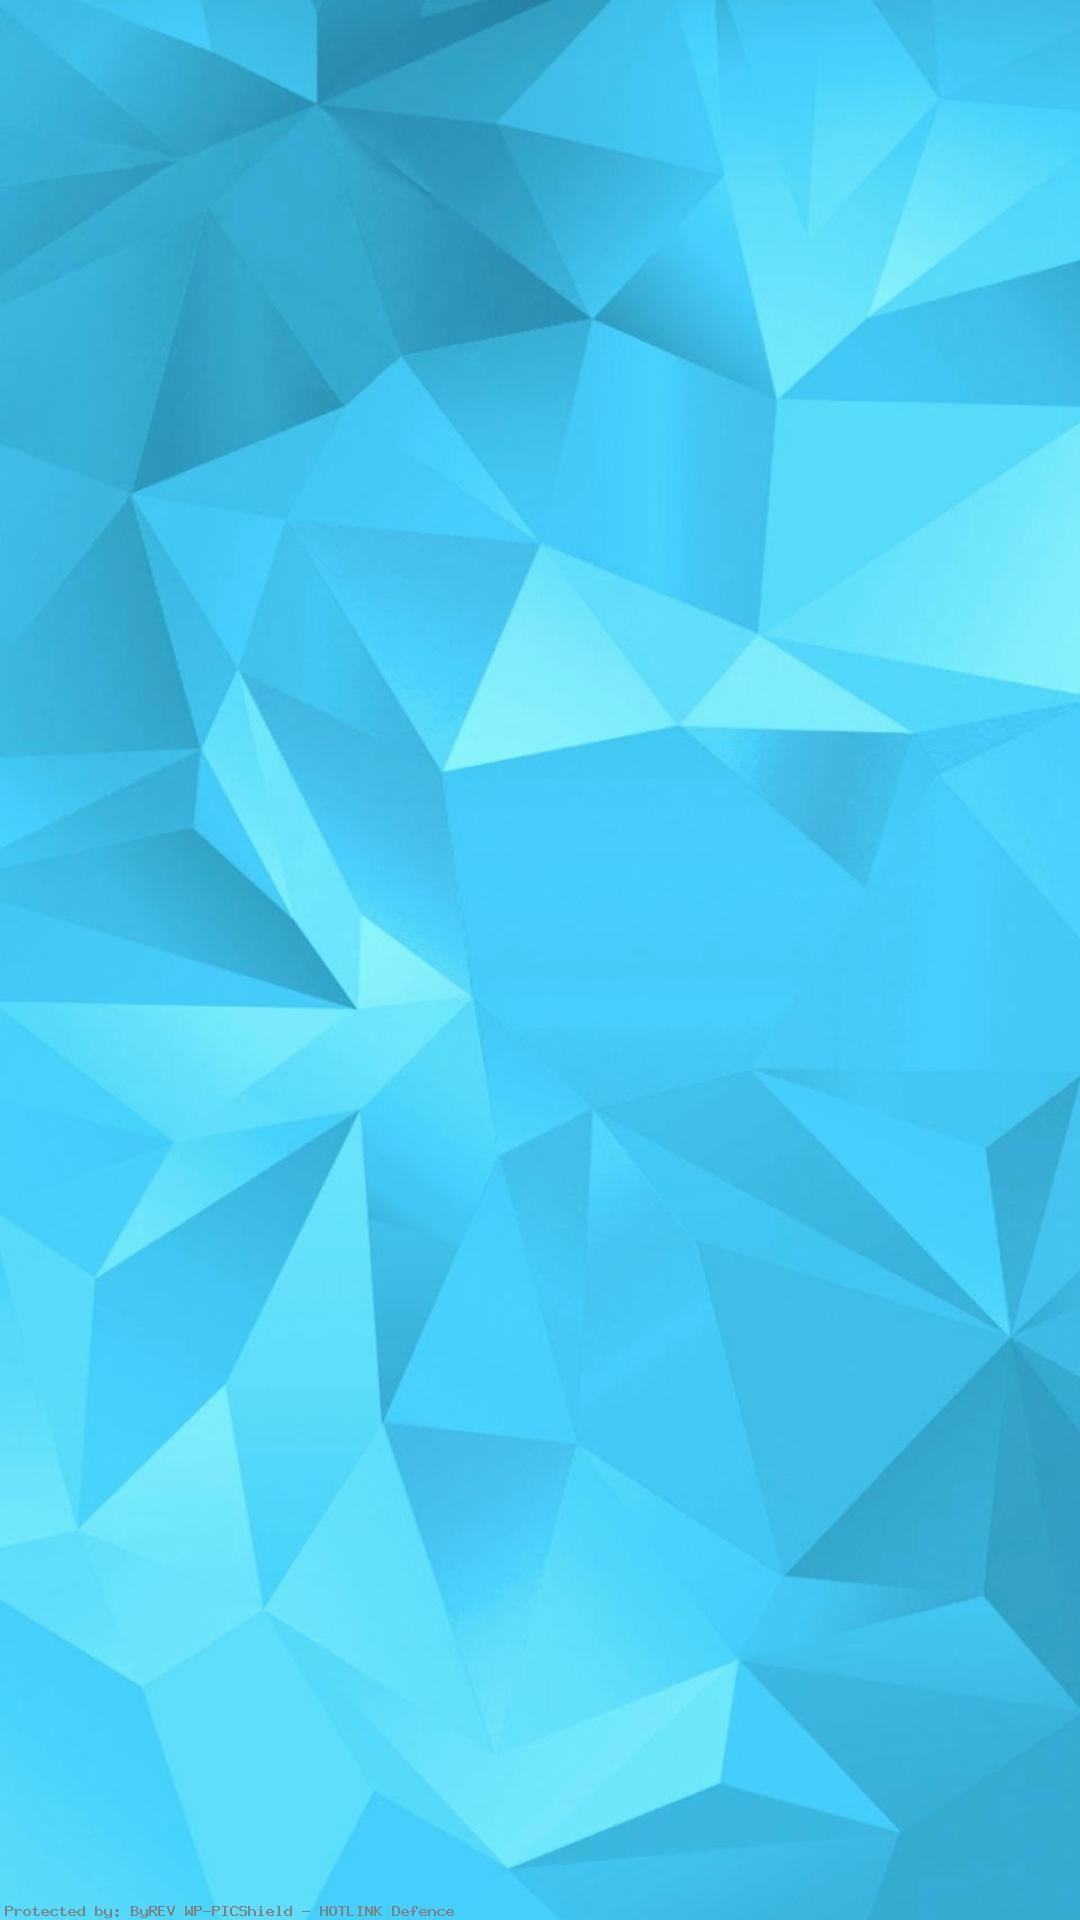 Simple-Blue-Fold-Polygon-Pattern-iPhone-plus-wallpaper-